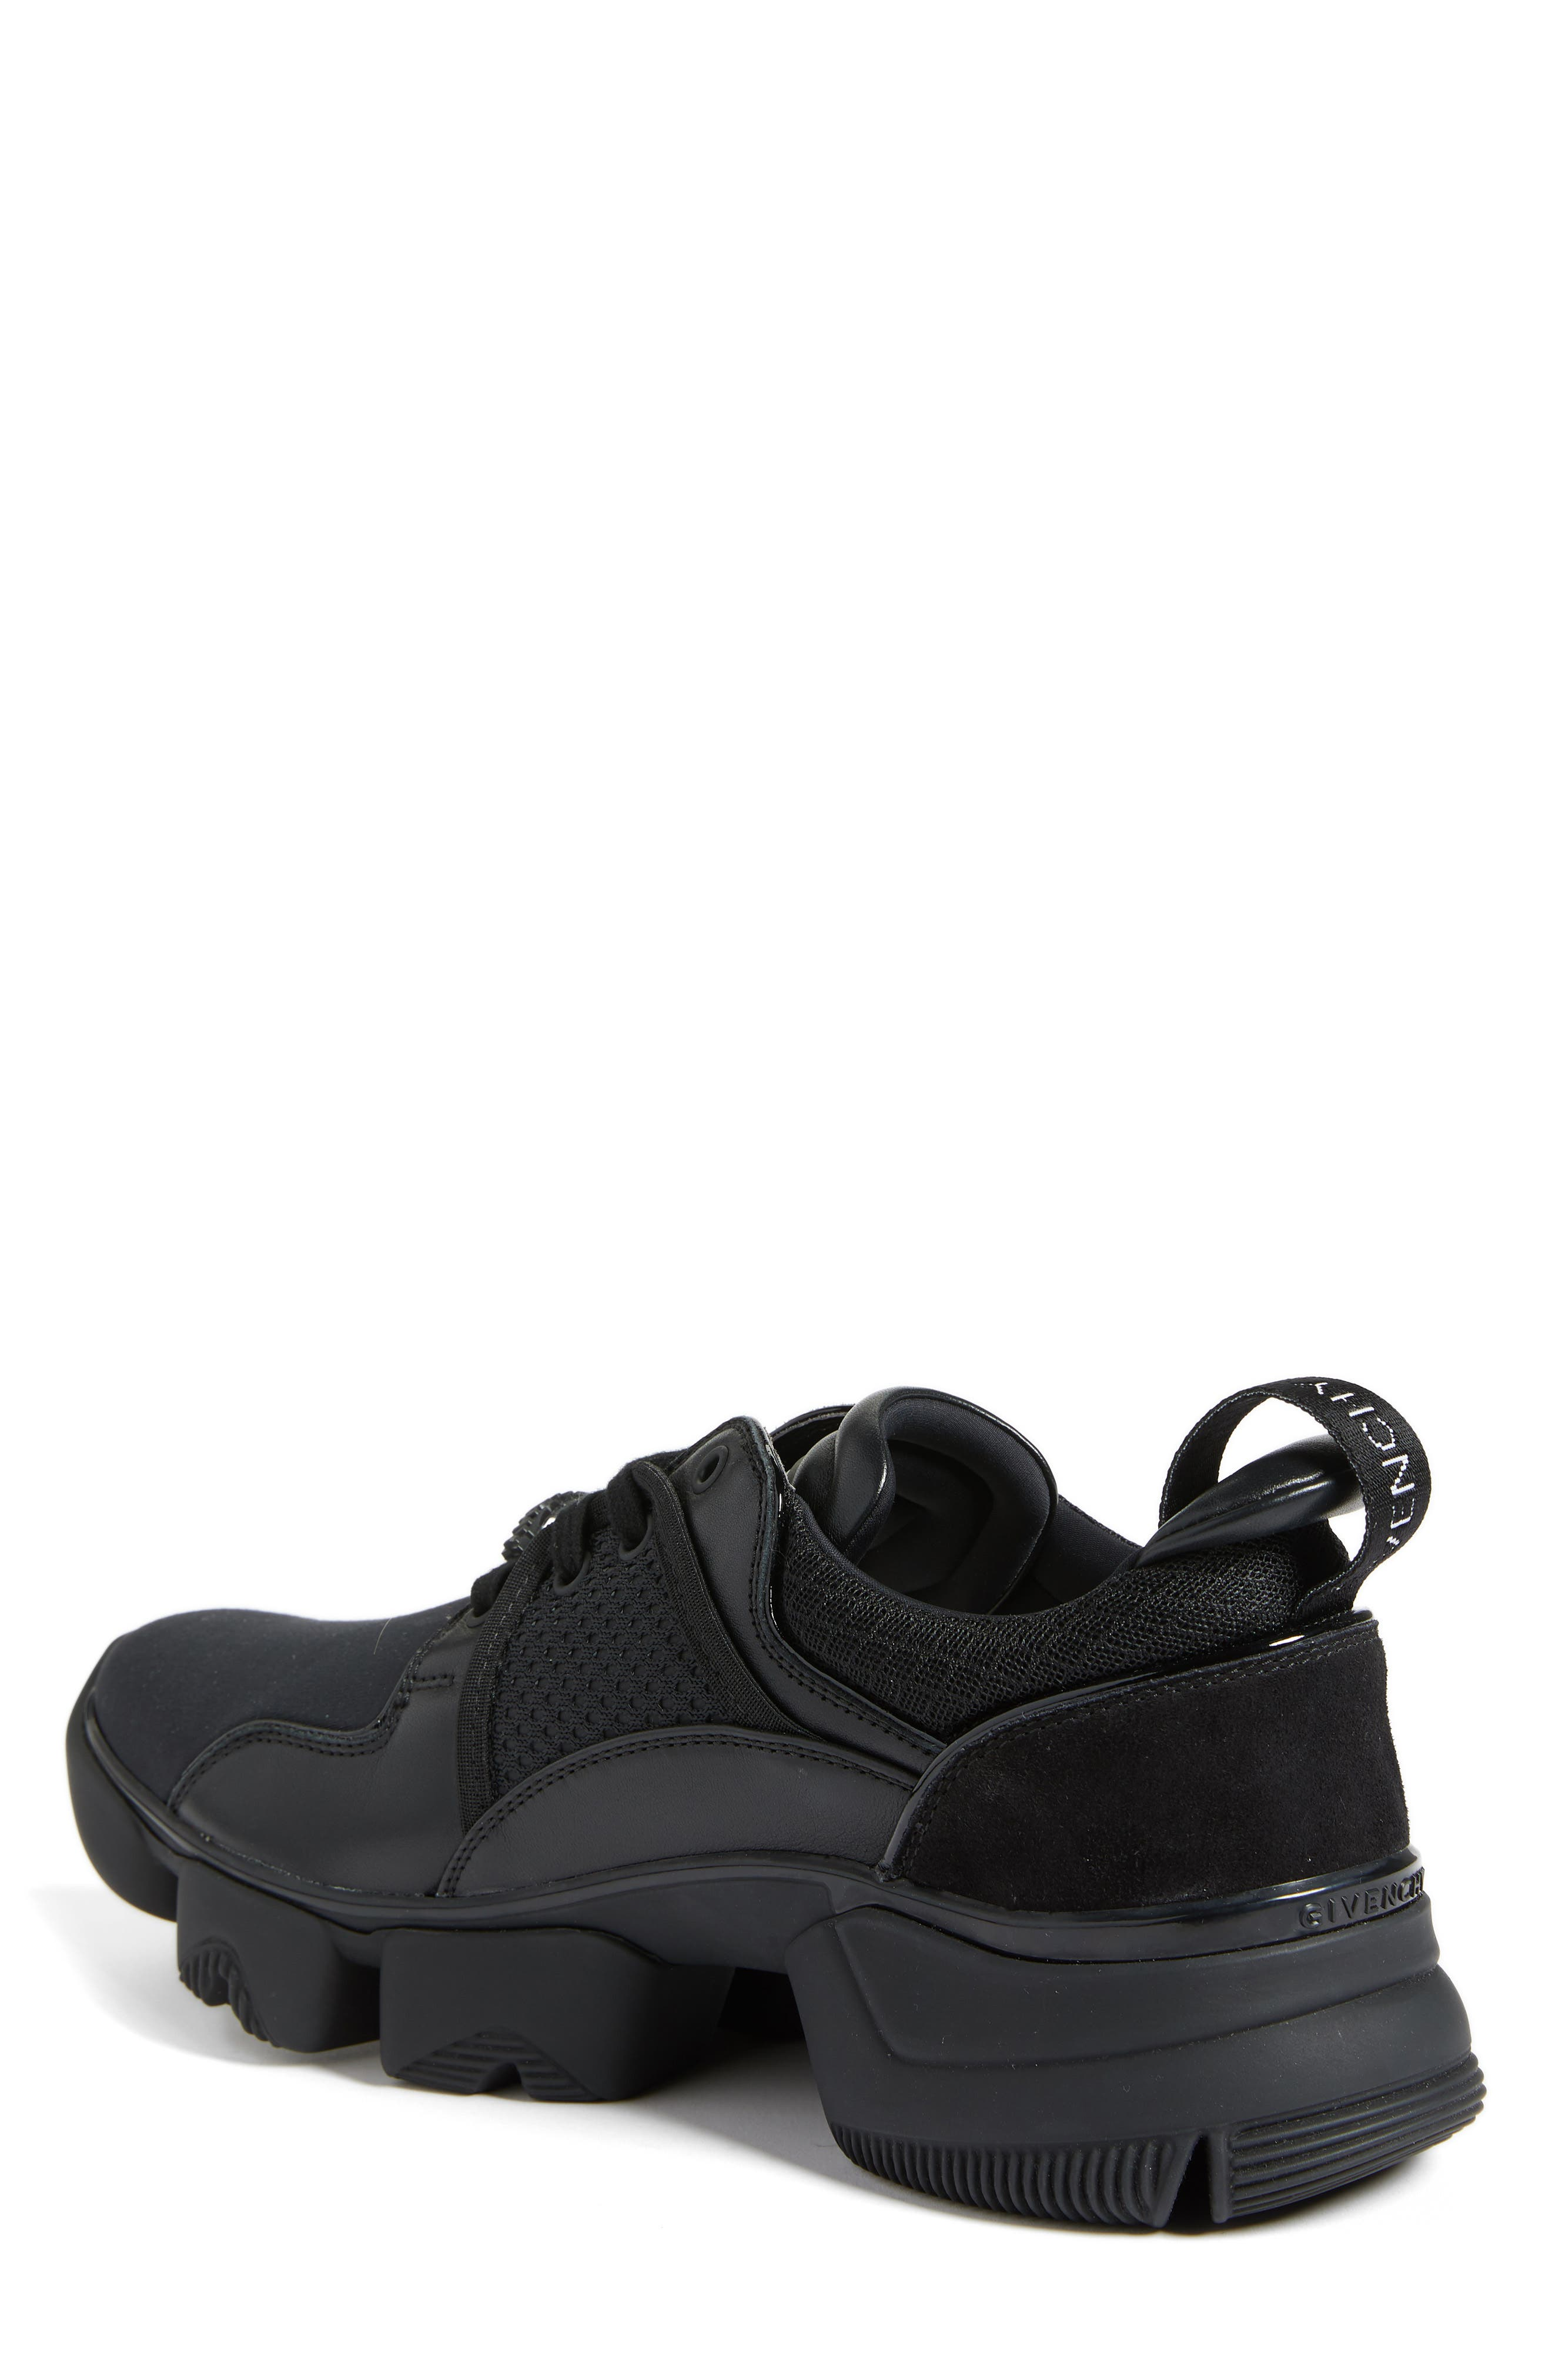 Jaw Sneaker,                             Alternate thumbnail 2, color,                             BLACK